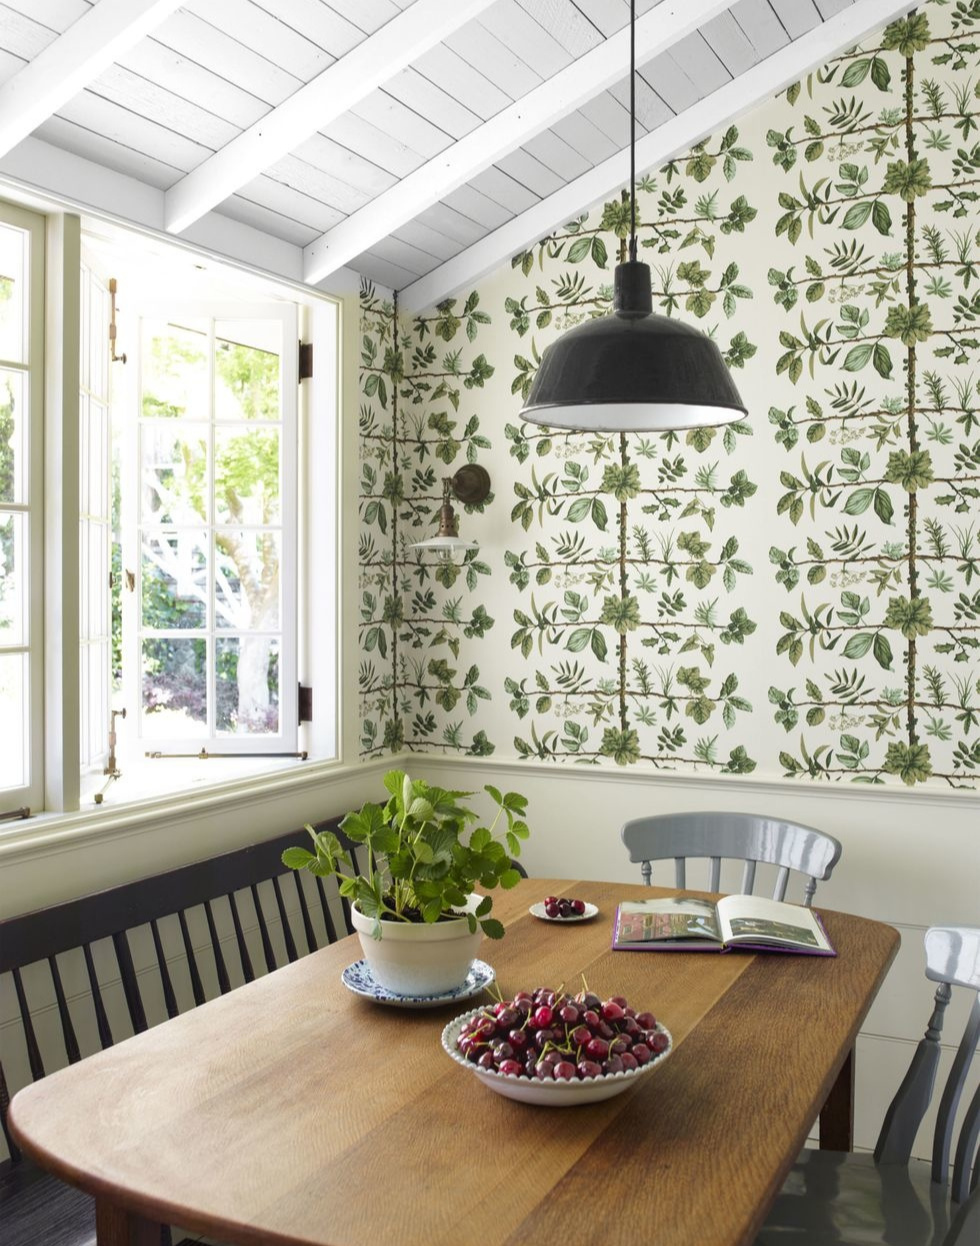 Обои на кухне: 10 свежих идей (галерея 0, фото 3)